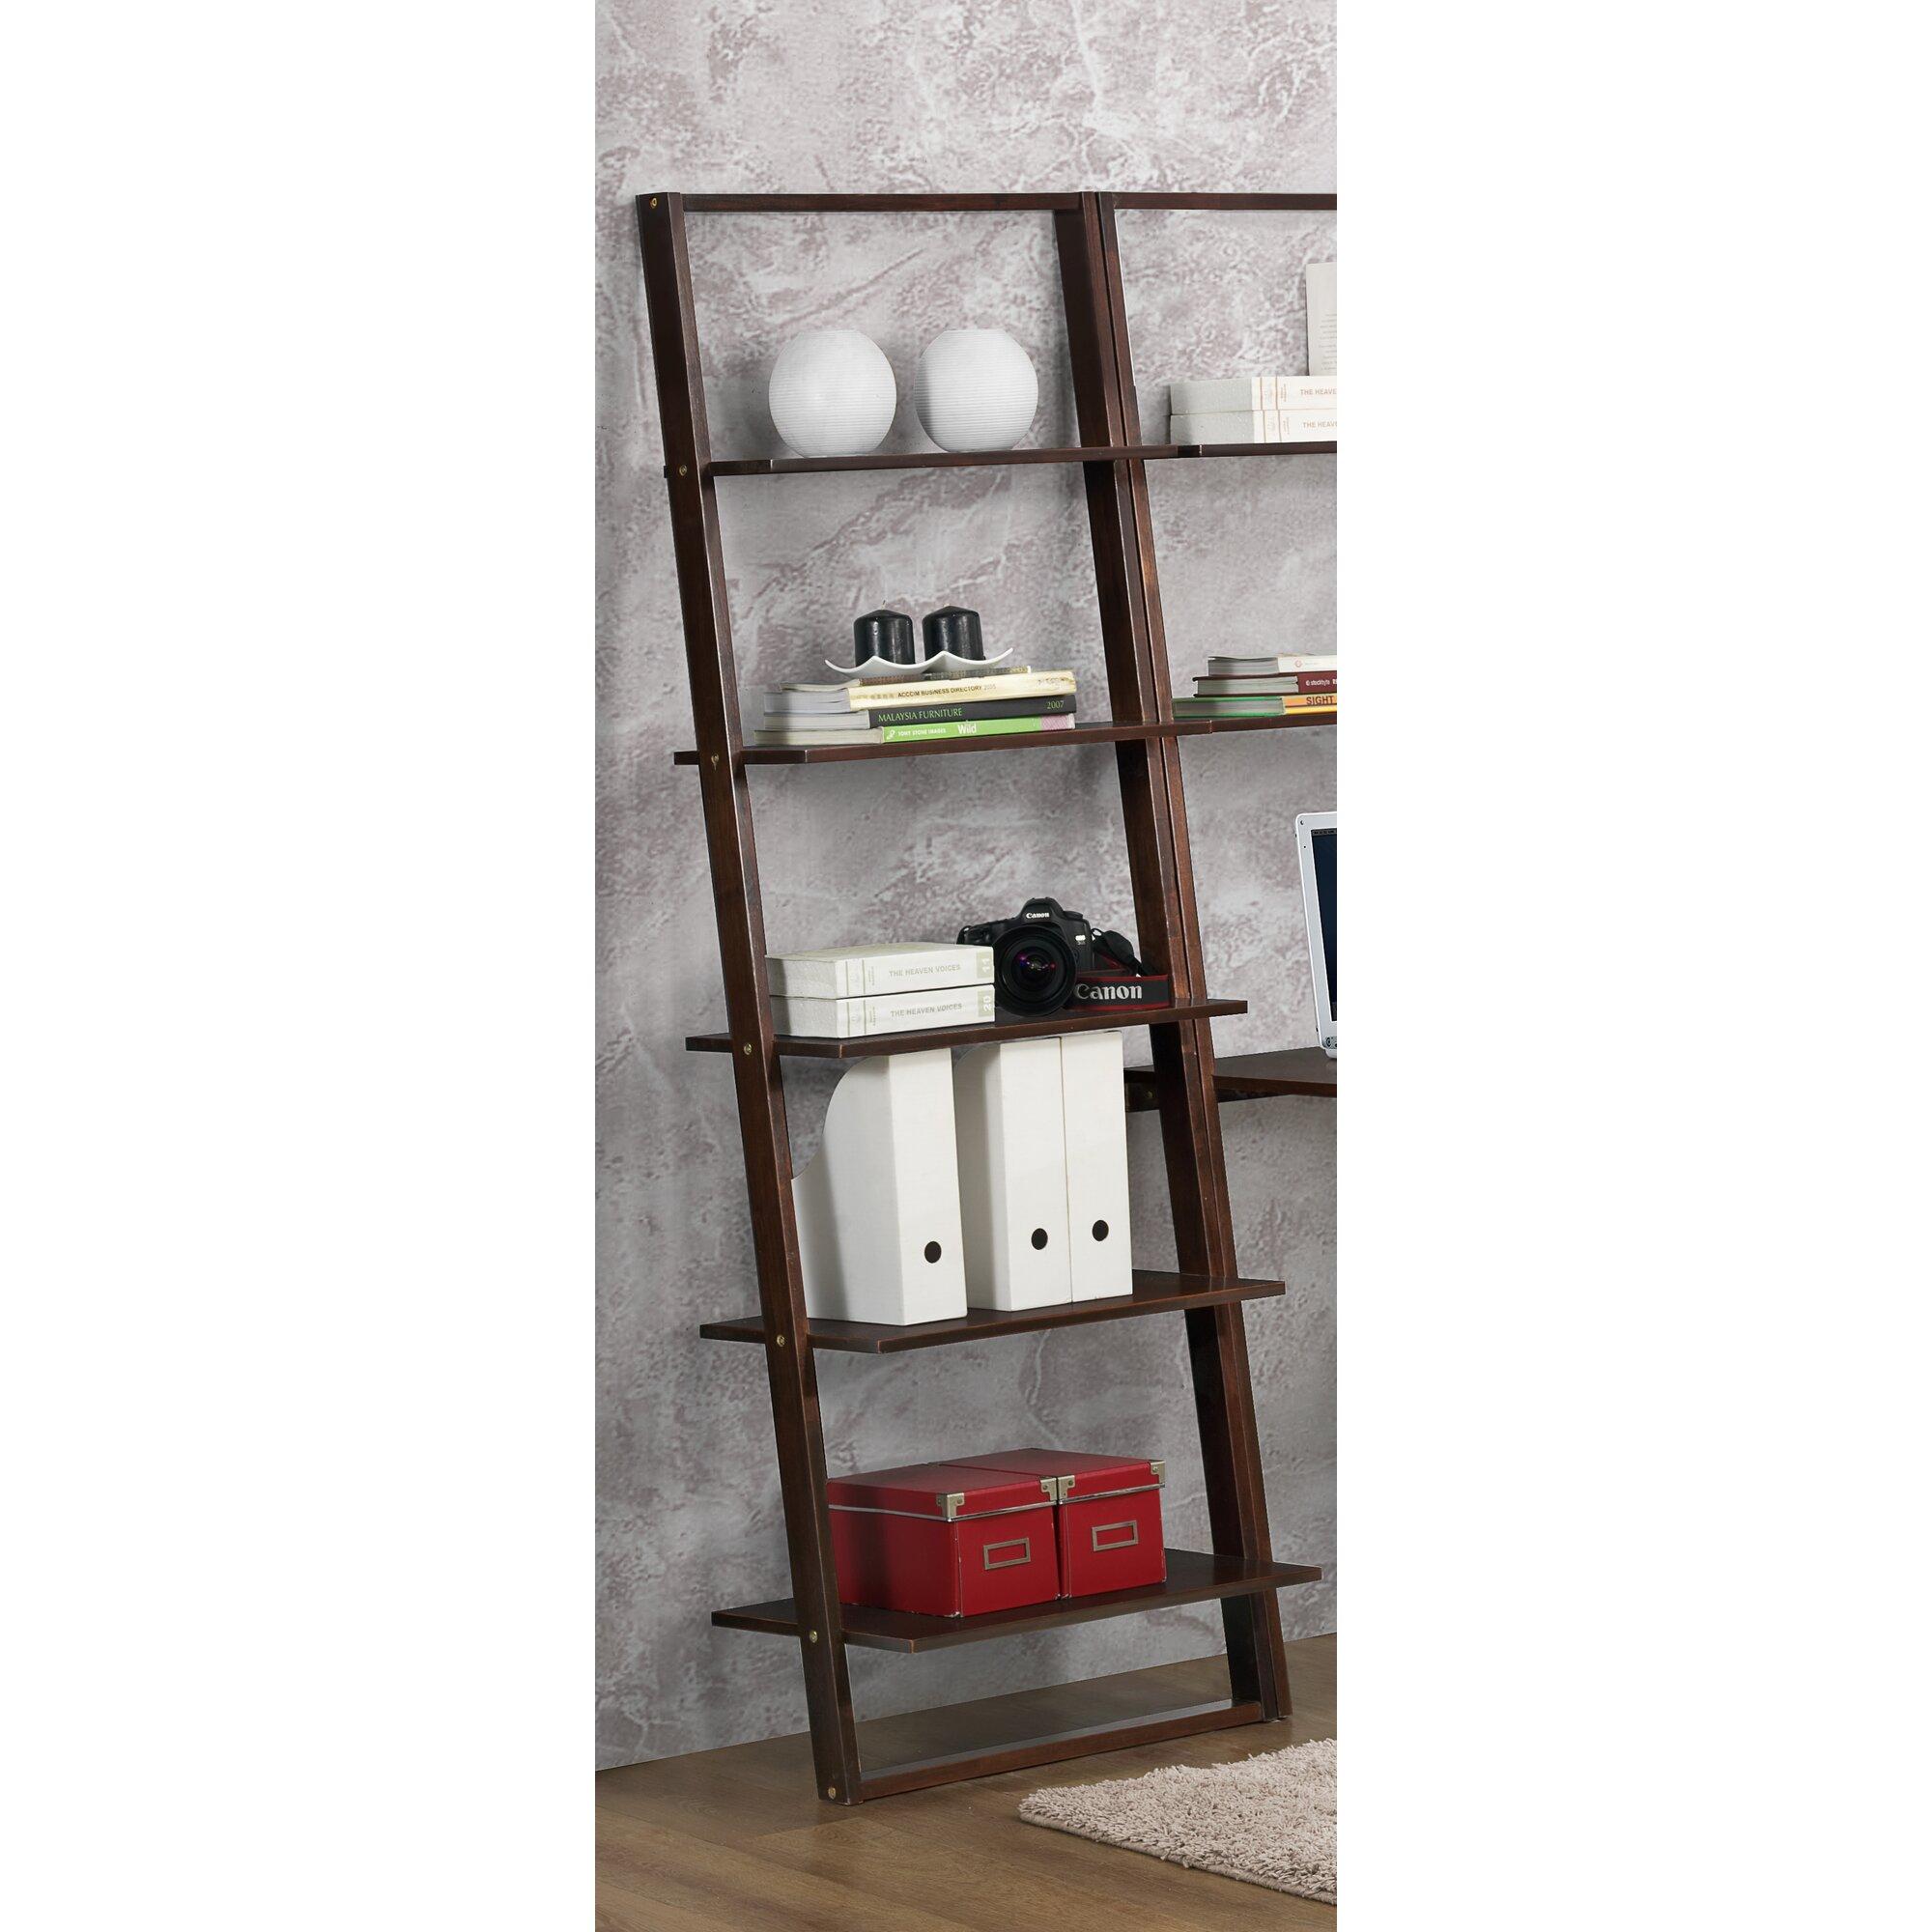 4d concepts arlington wall 72 leaning bookcase reviews wayfair. Black Bedroom Furniture Sets. Home Design Ideas